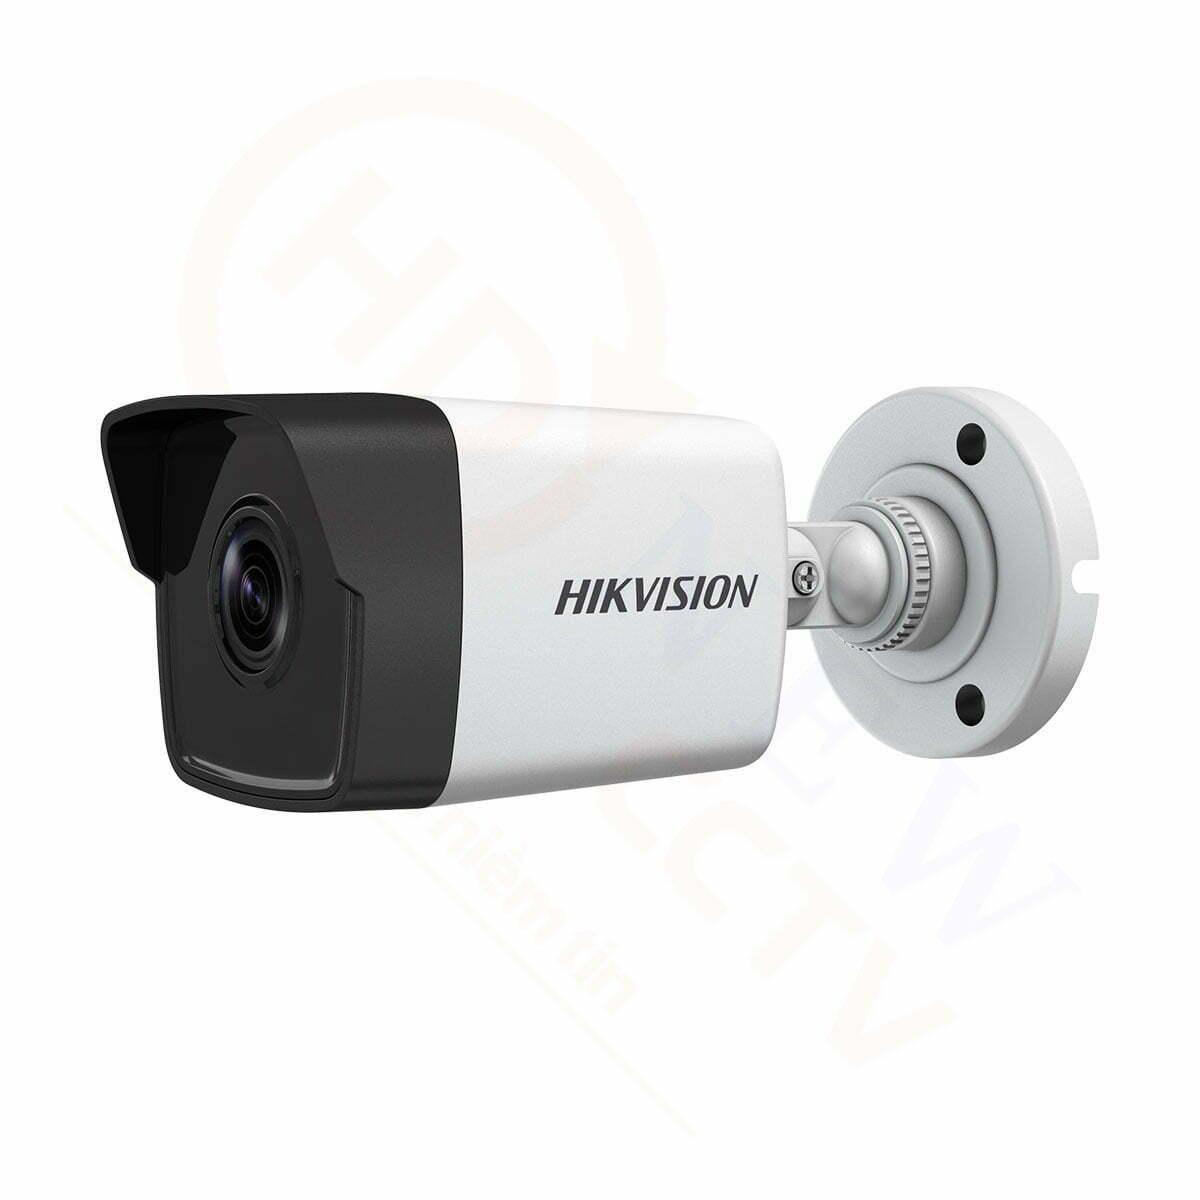 Hikvision DS-2CD1023G0E-I(L) | Camera IP PoE 2MP | HDnew CCTV